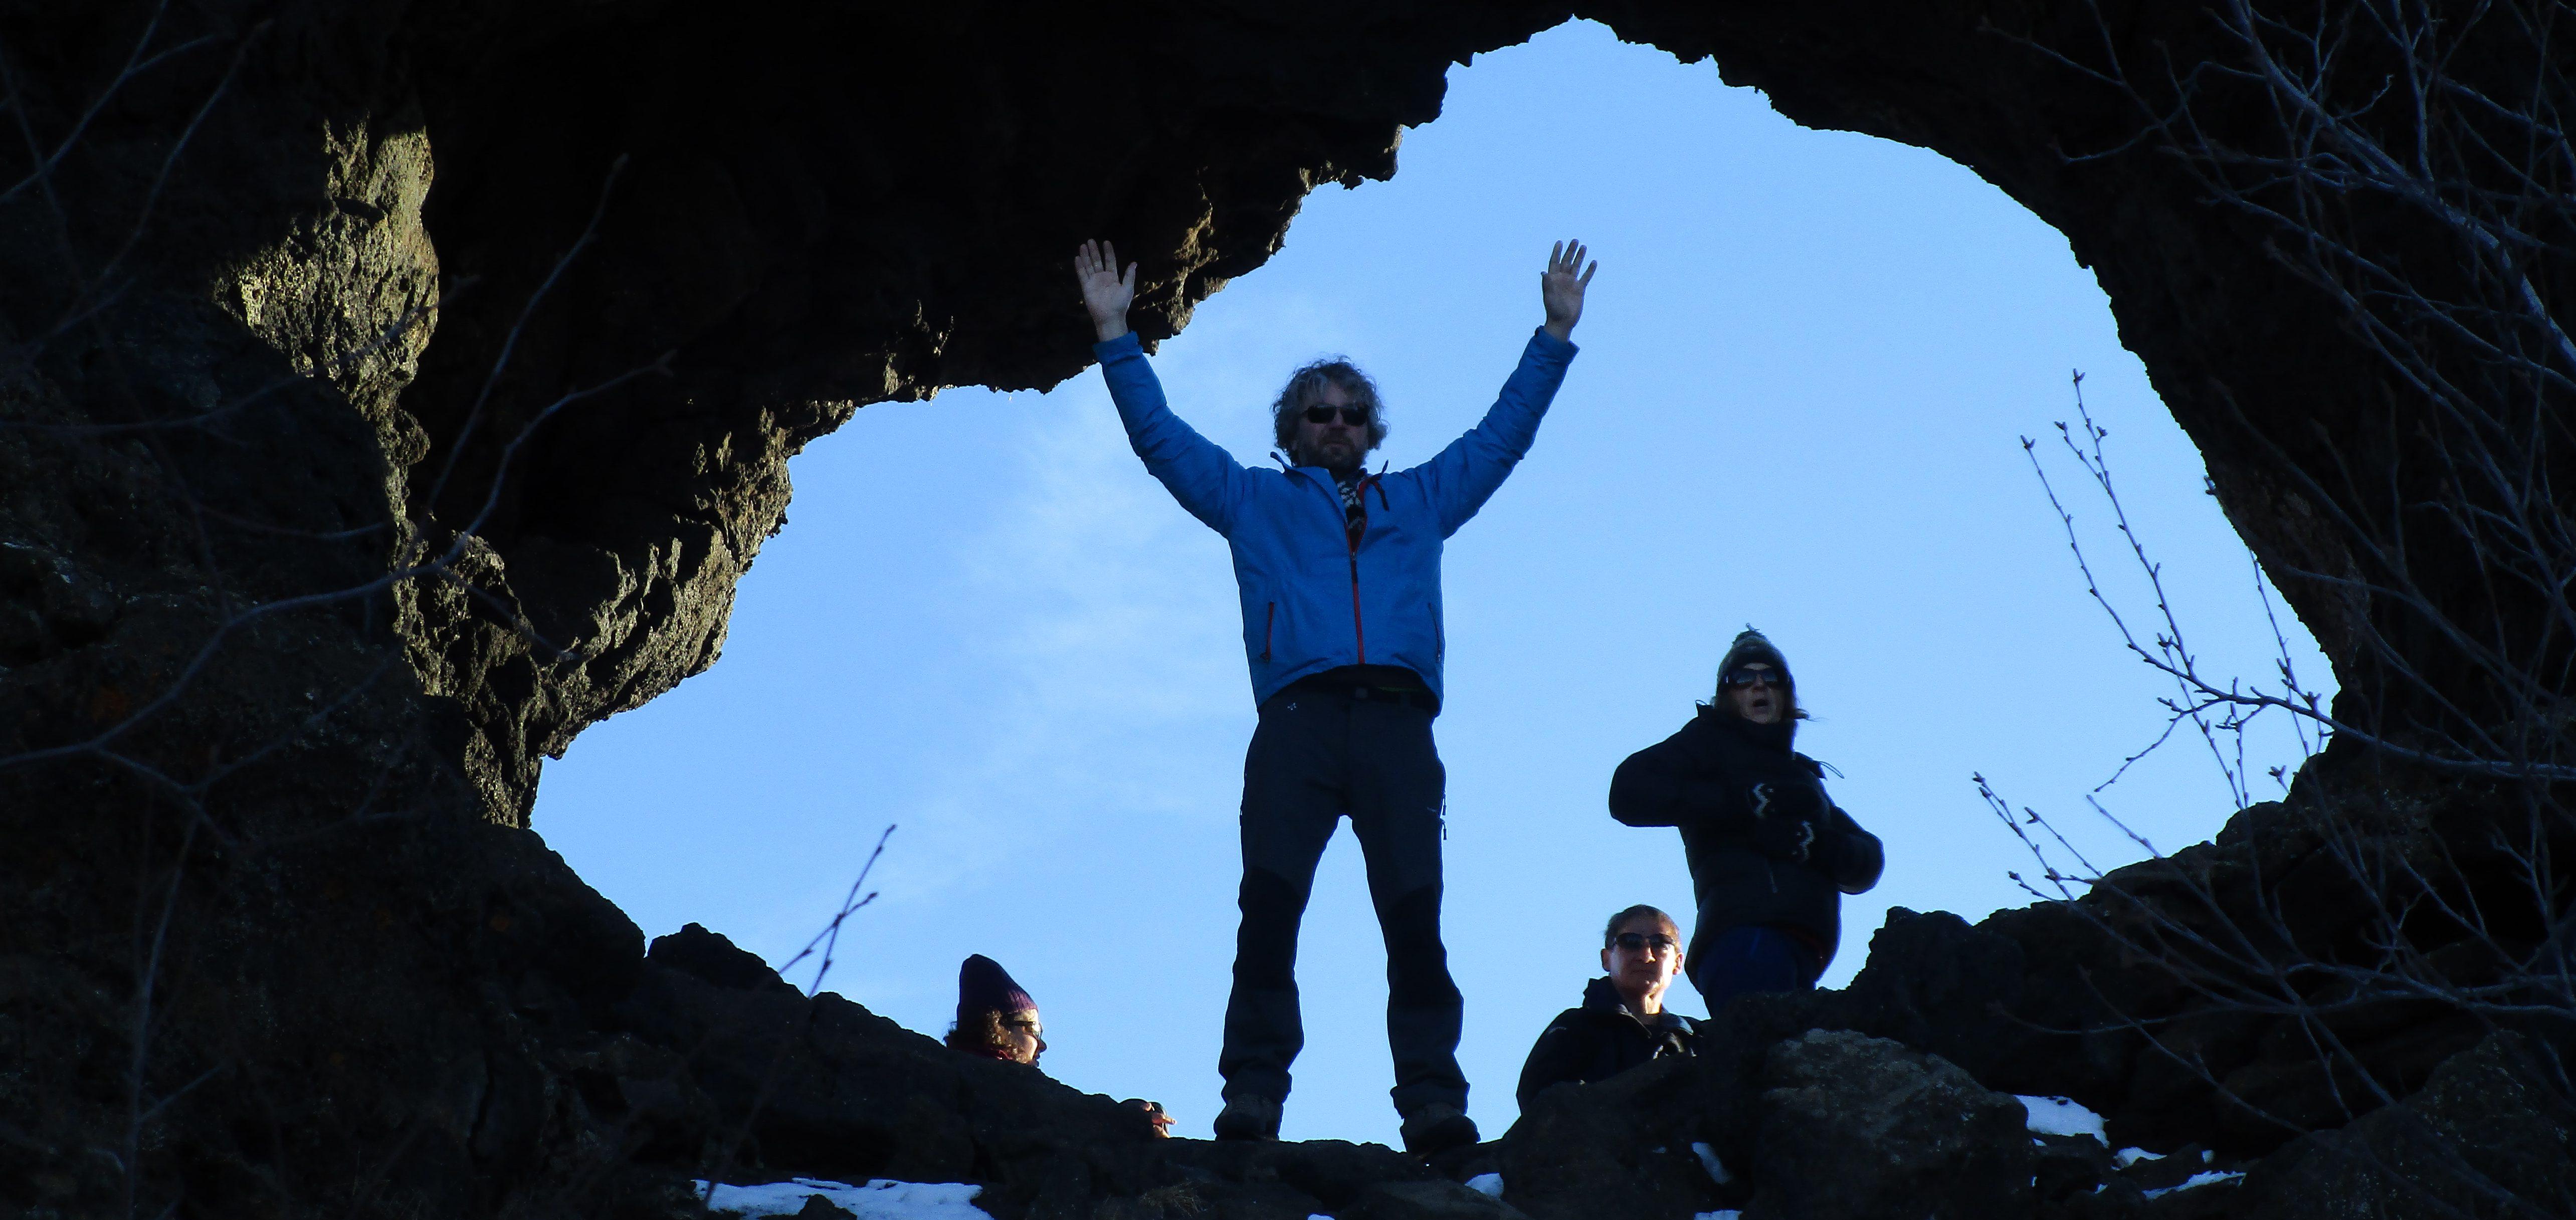 Mann am Felsdurchgang in Dimmuborgir in Island